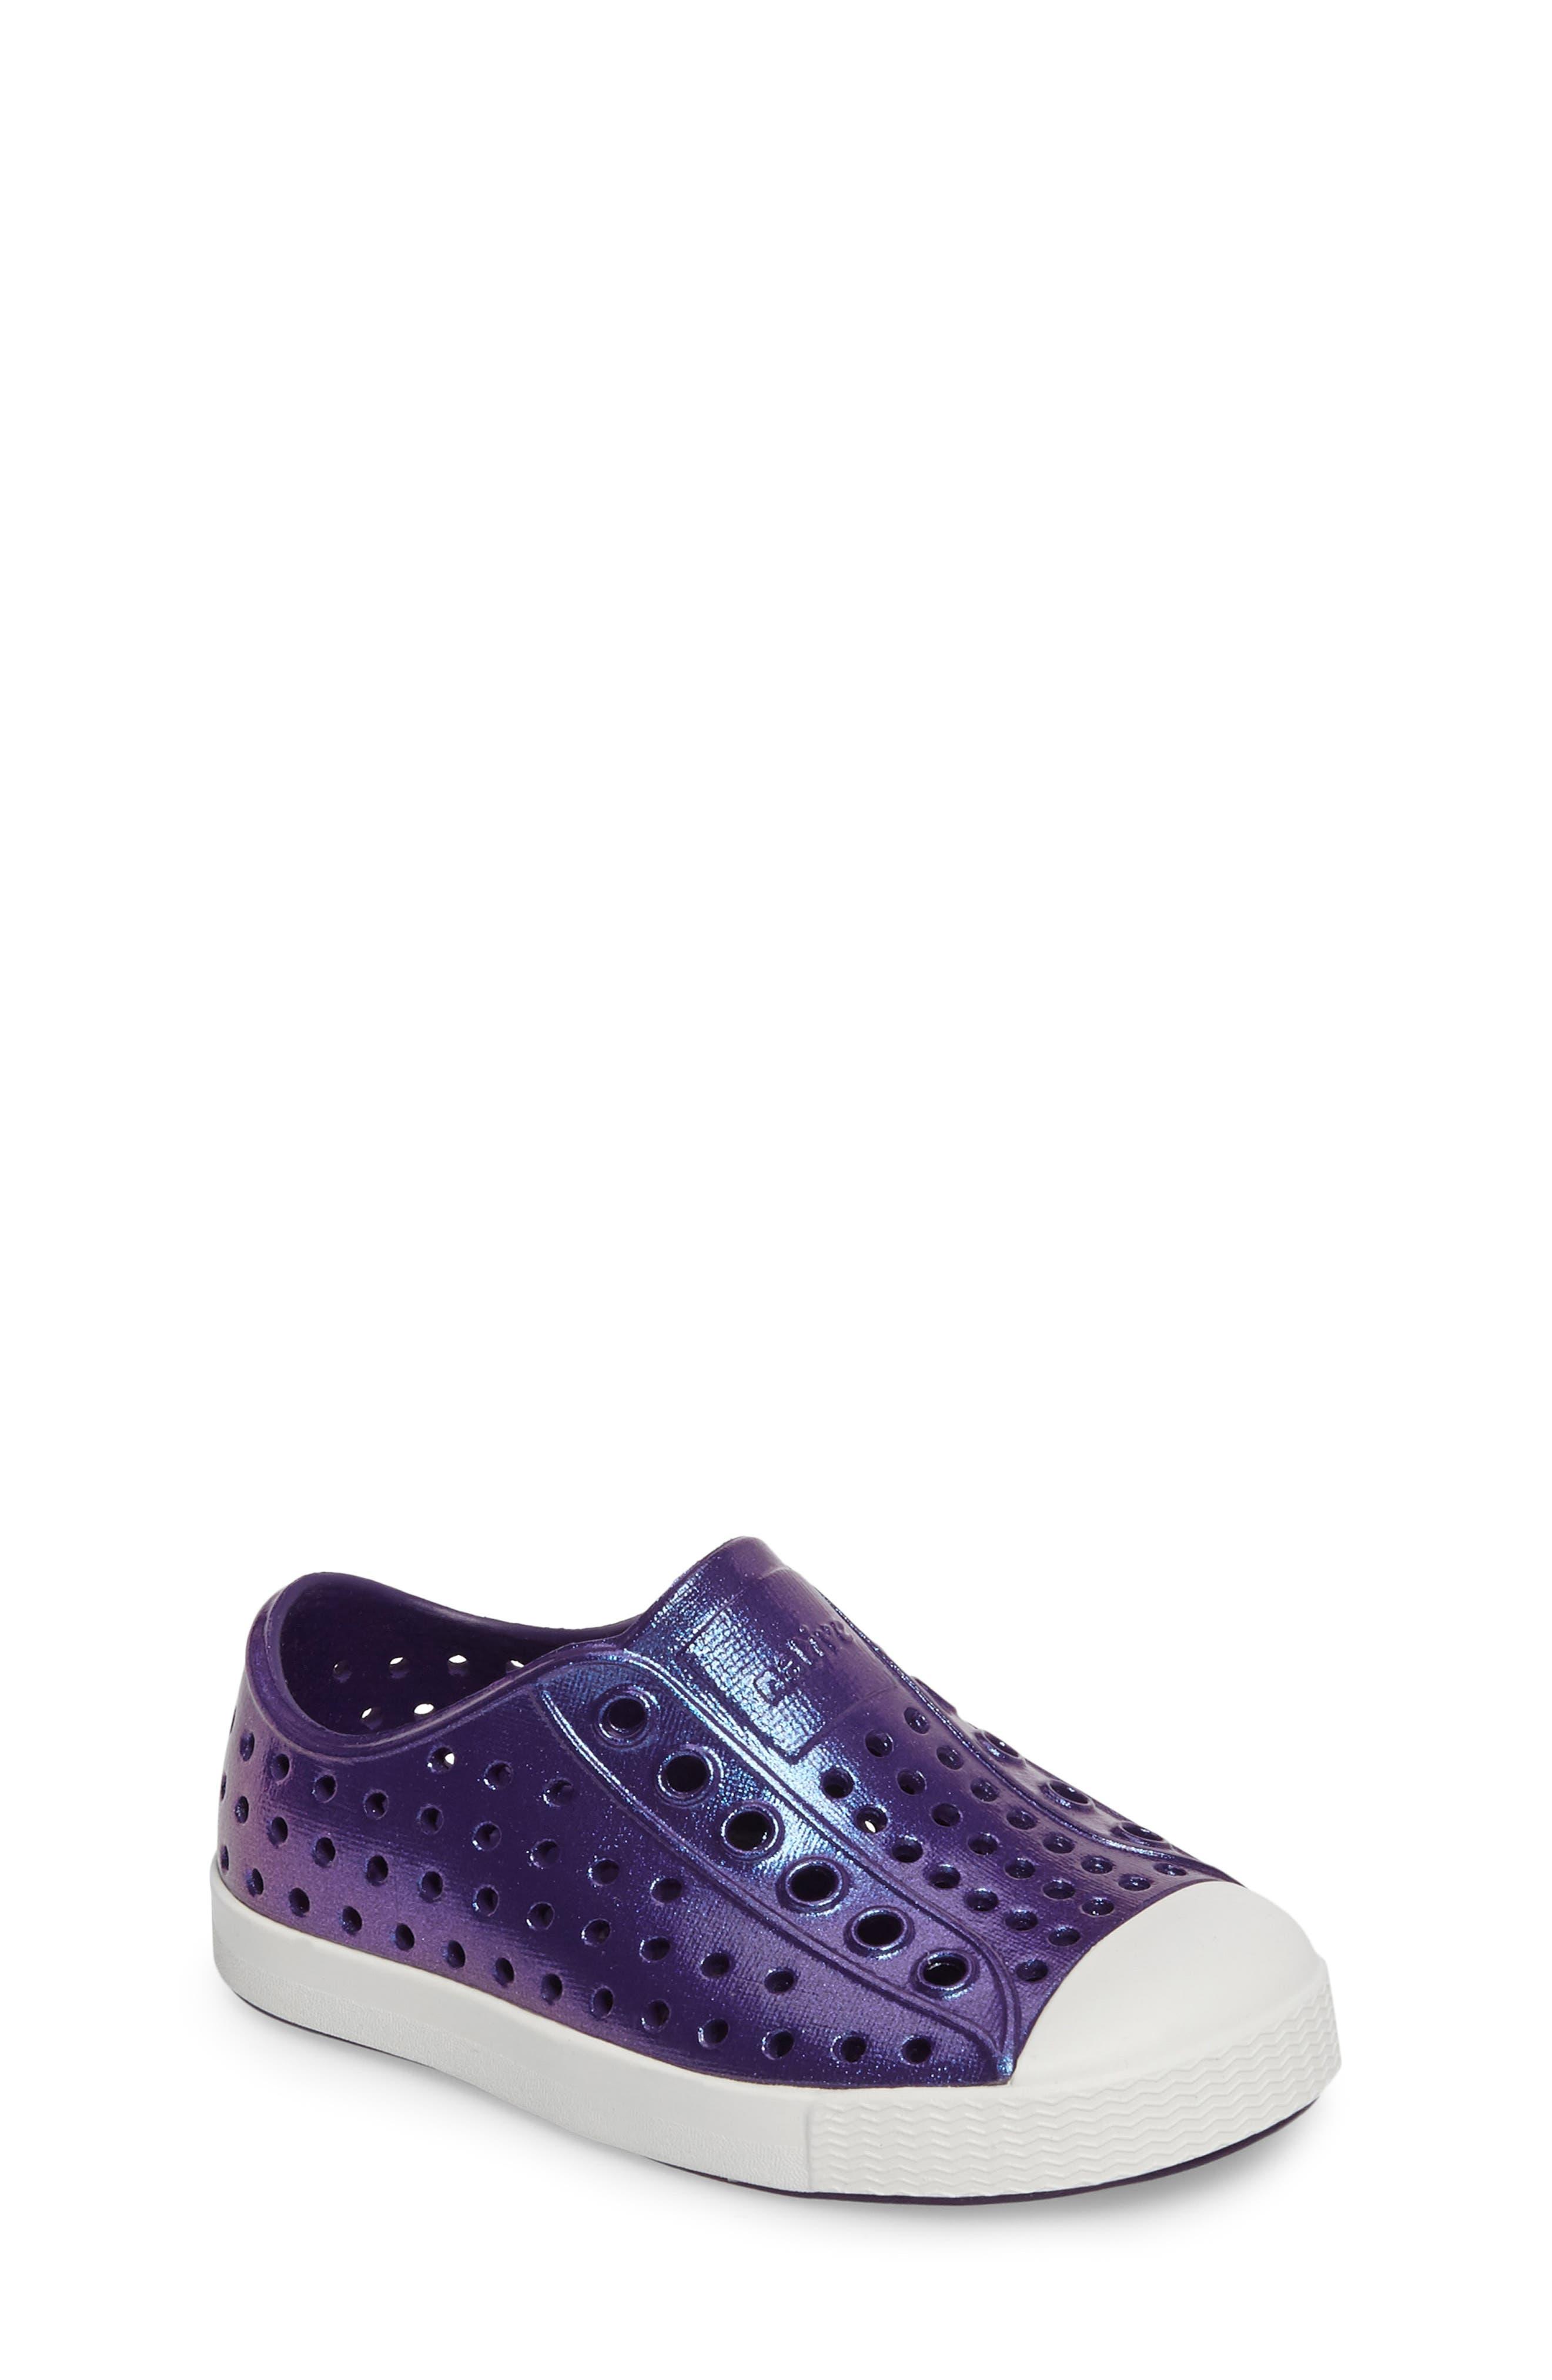 Alternate Image 1 Selected - Native Shoes 'Jefferson' Iridescent Slip-On Sneaker (Baby, Walker, Toddler & Little Kid)